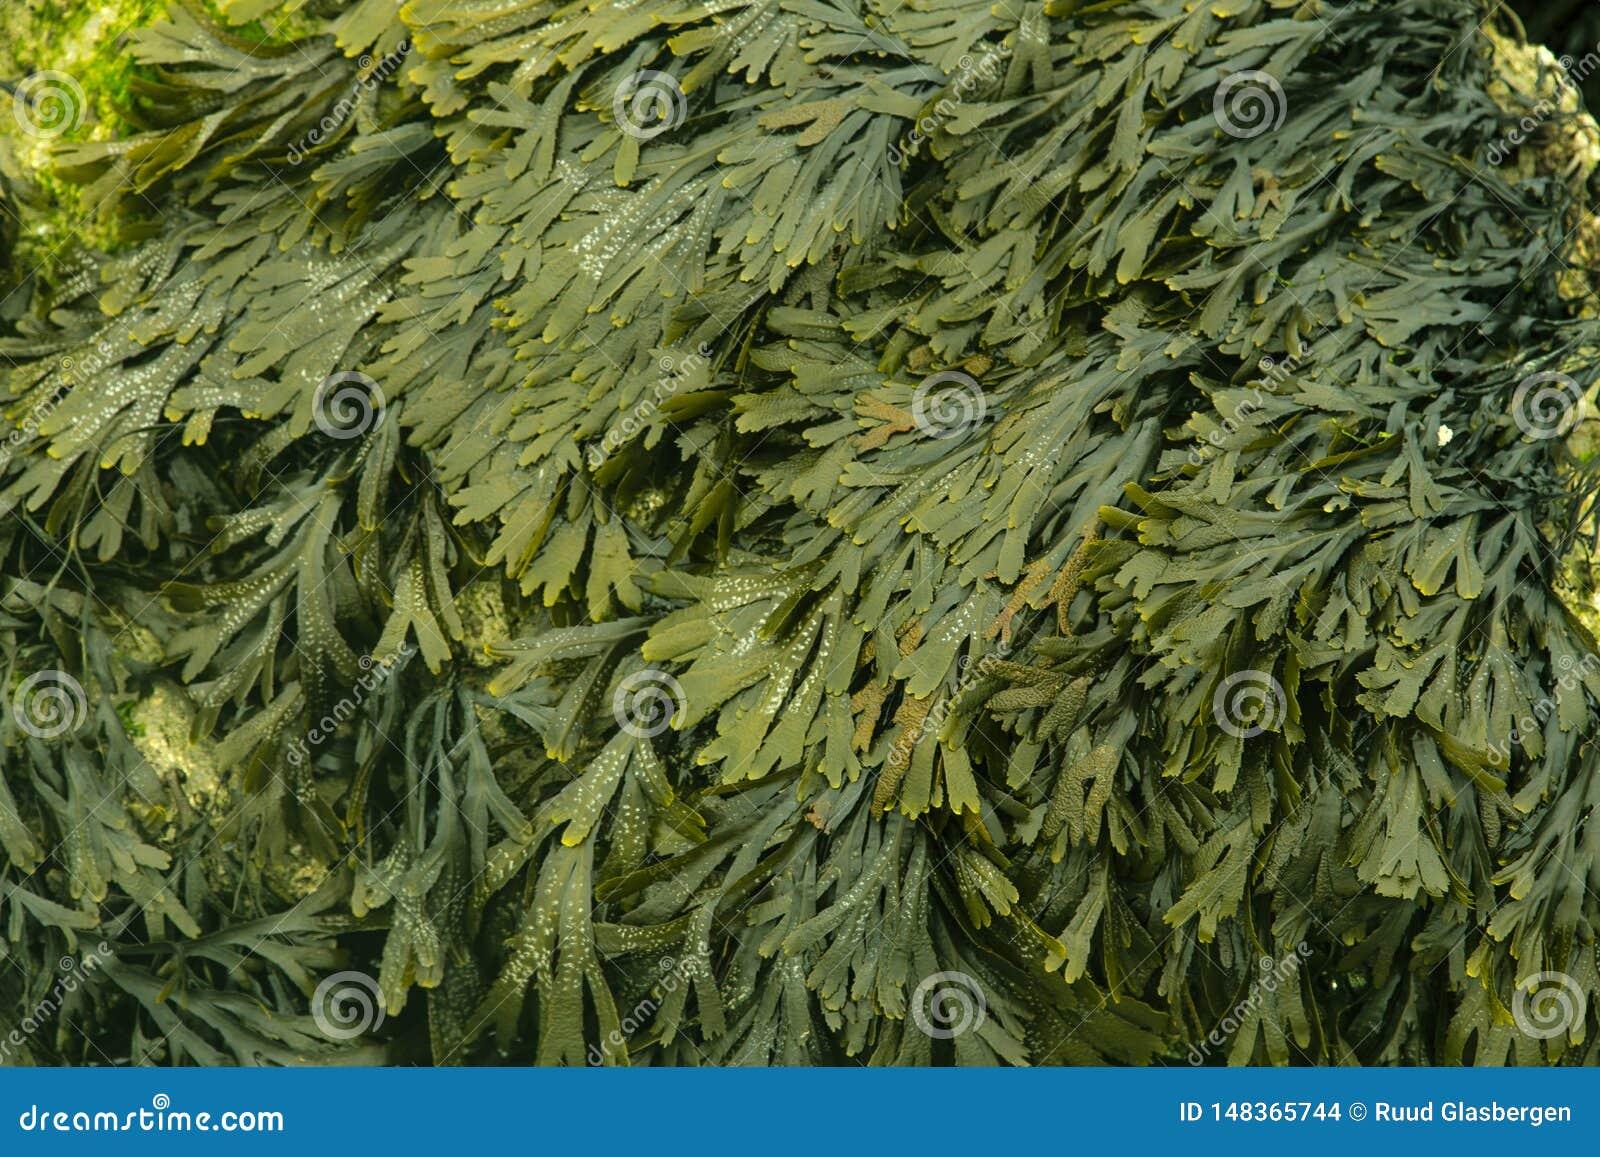 Seaweed, healthy food of the future